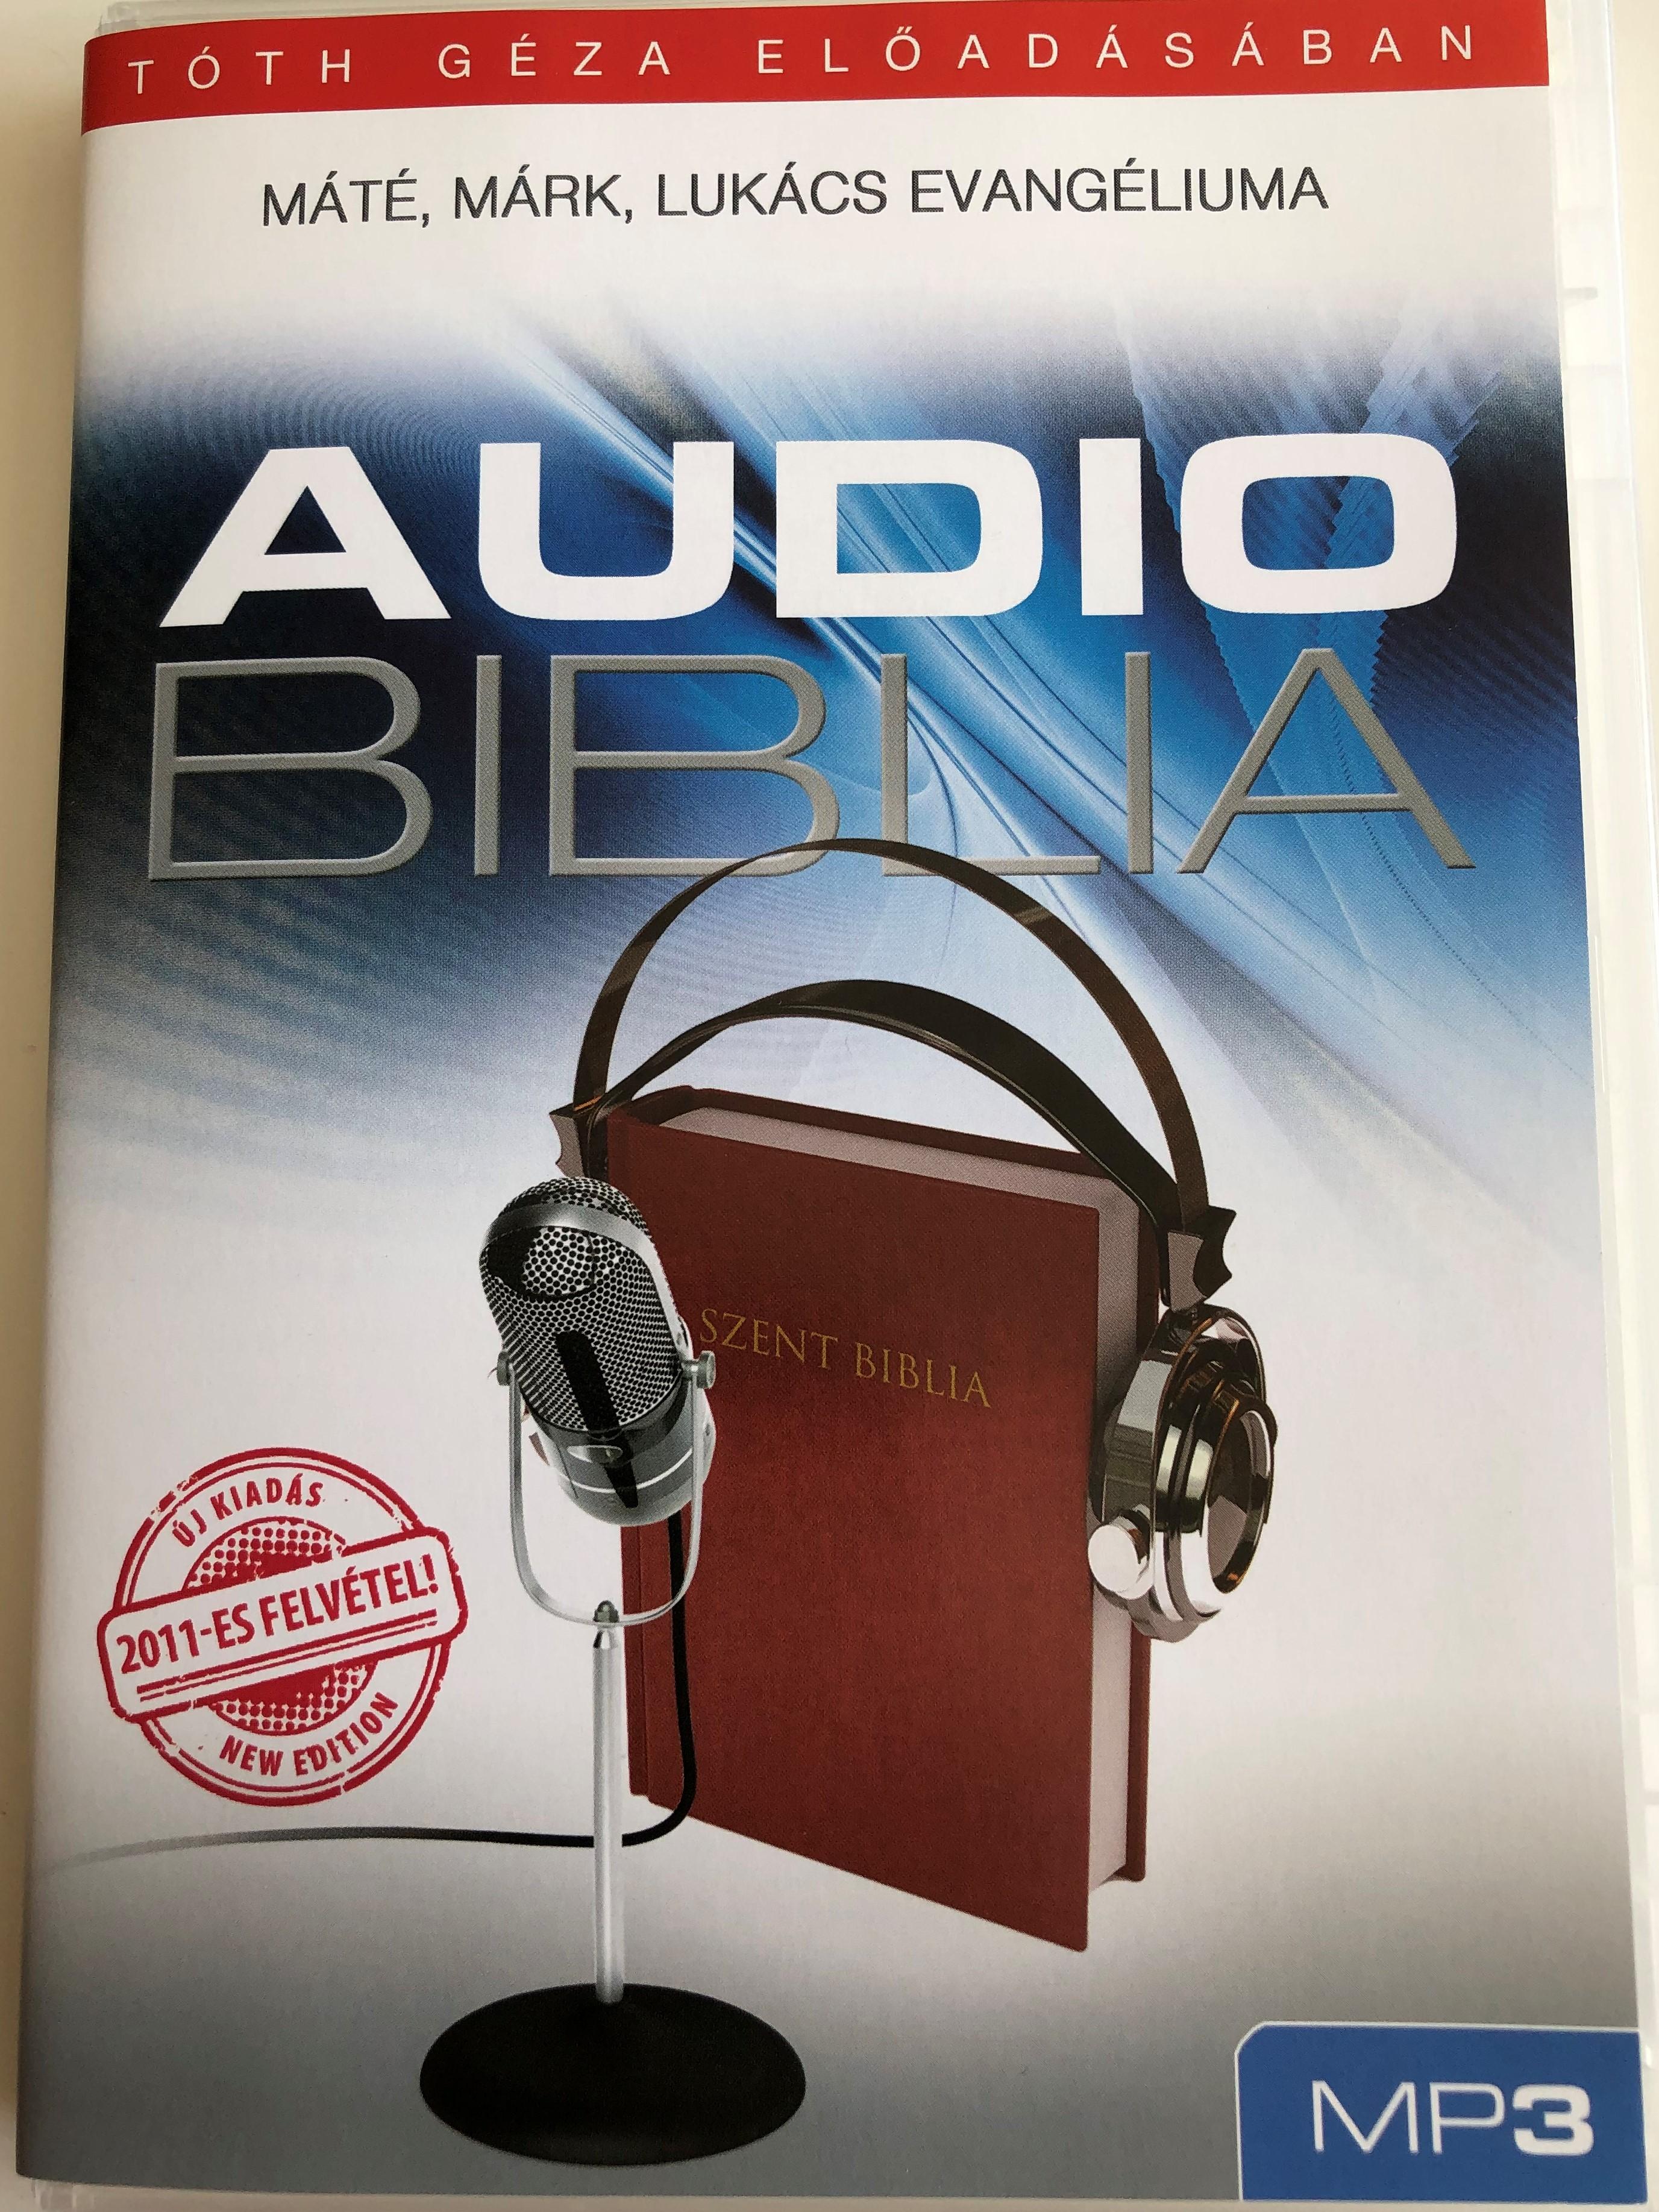 audio-biblia-m-t-m-rk-luk-cs-evang-liuma-t-th-g-za-el-ad-s-ban-hungarian-language-audio-bible-the-gospel-of-matthew-mark-luke-read-by-t-th-g-za-mp3-audio-cd-2011-audiobiblia.hu-1-.jpg